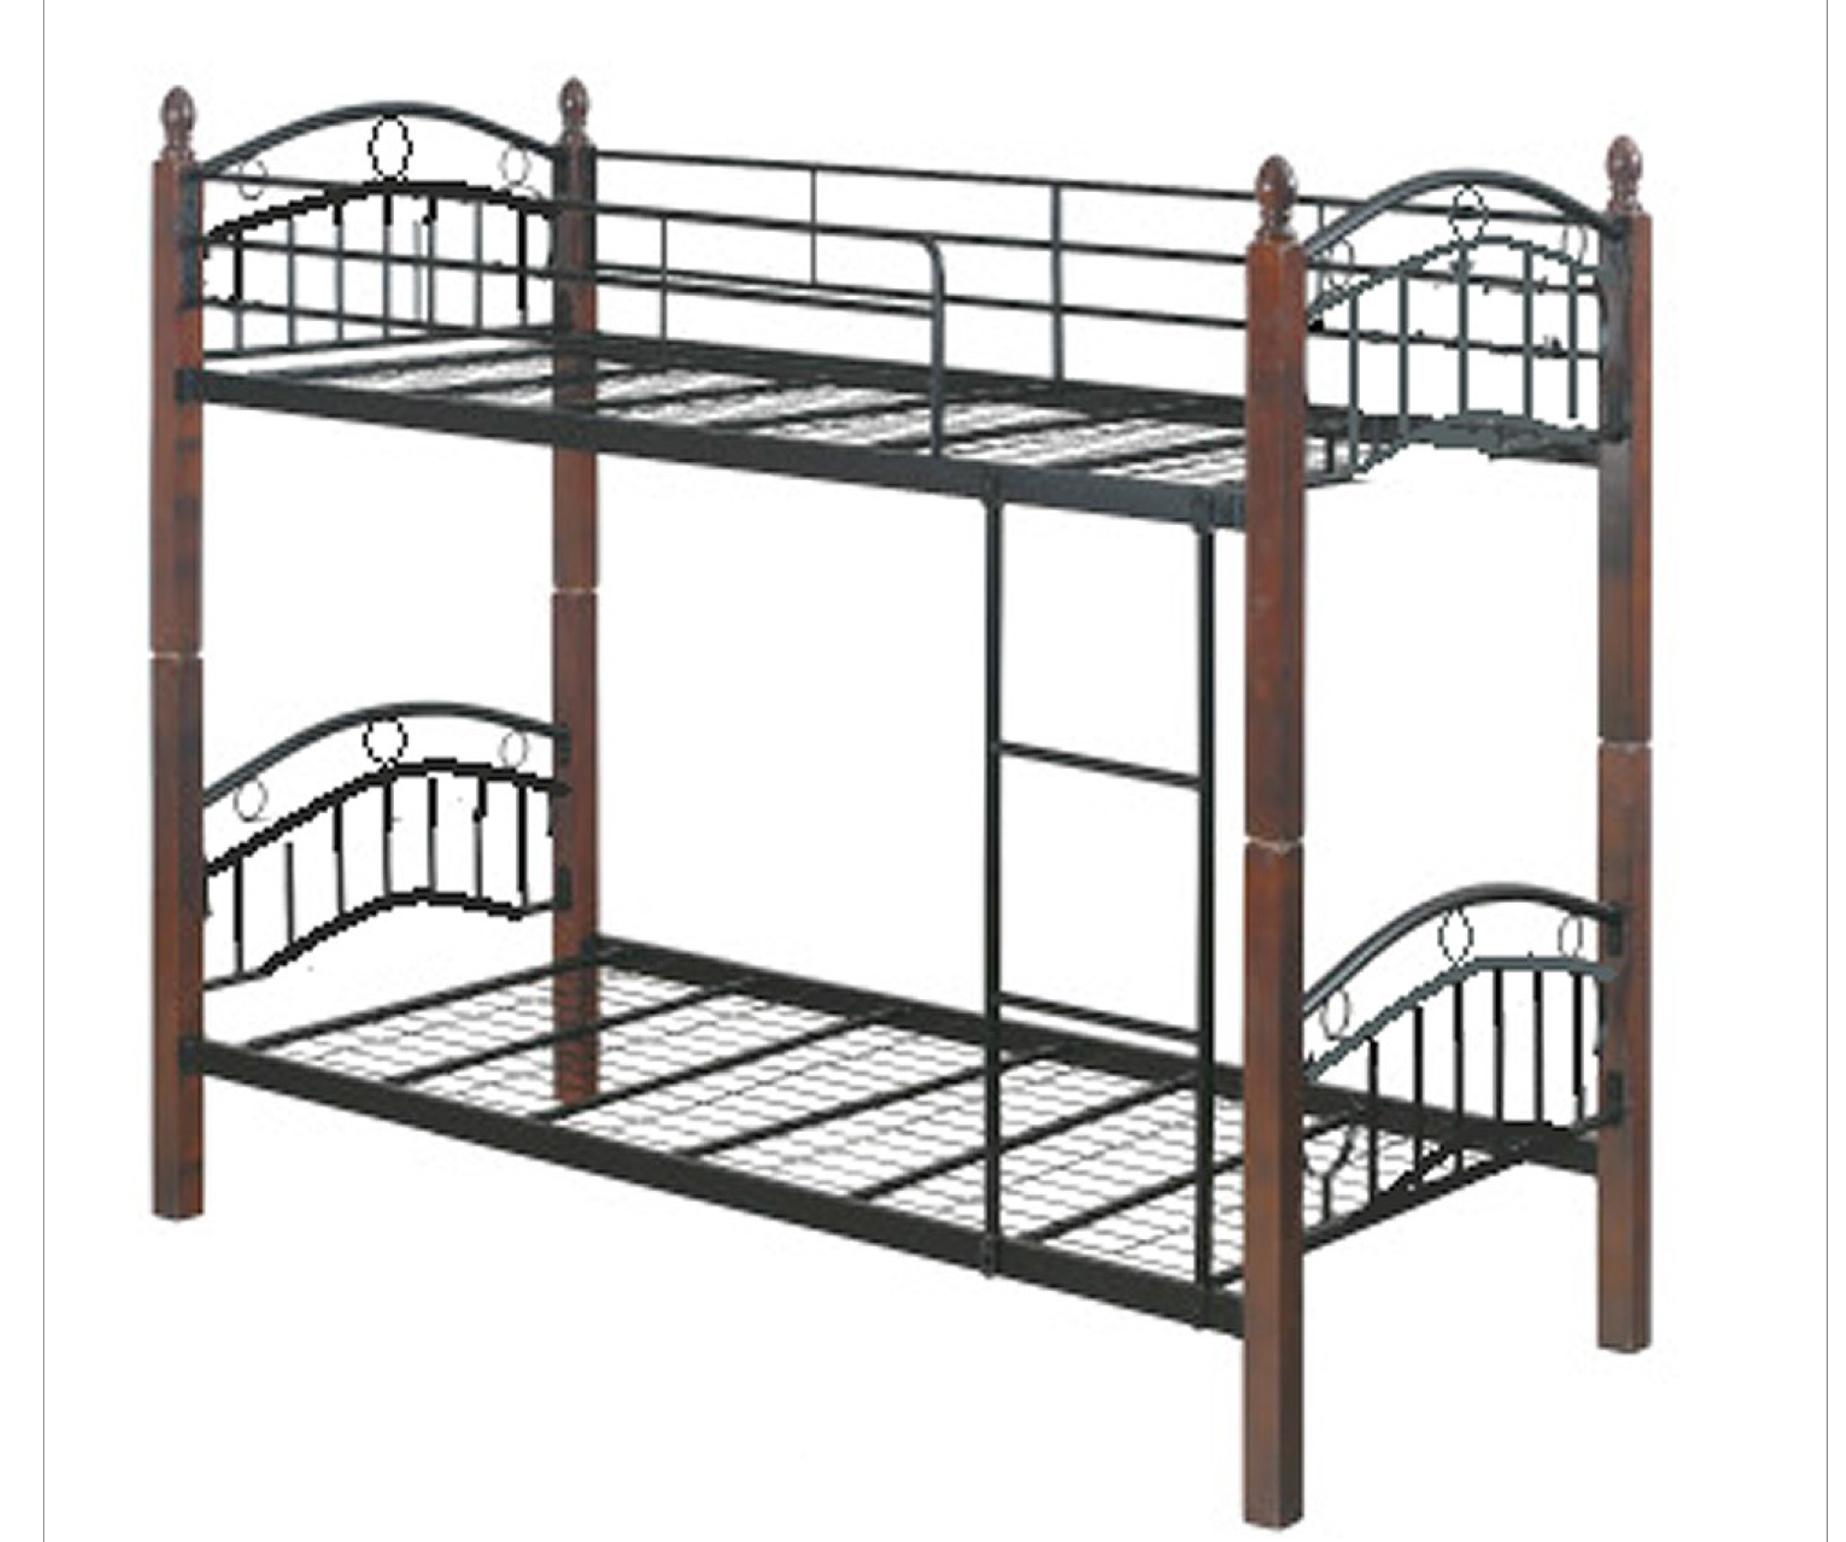 Double Deck Bed Design : ... Popular Posts Double Deck Bed Double Deck Bed Design Bed Designs Cool